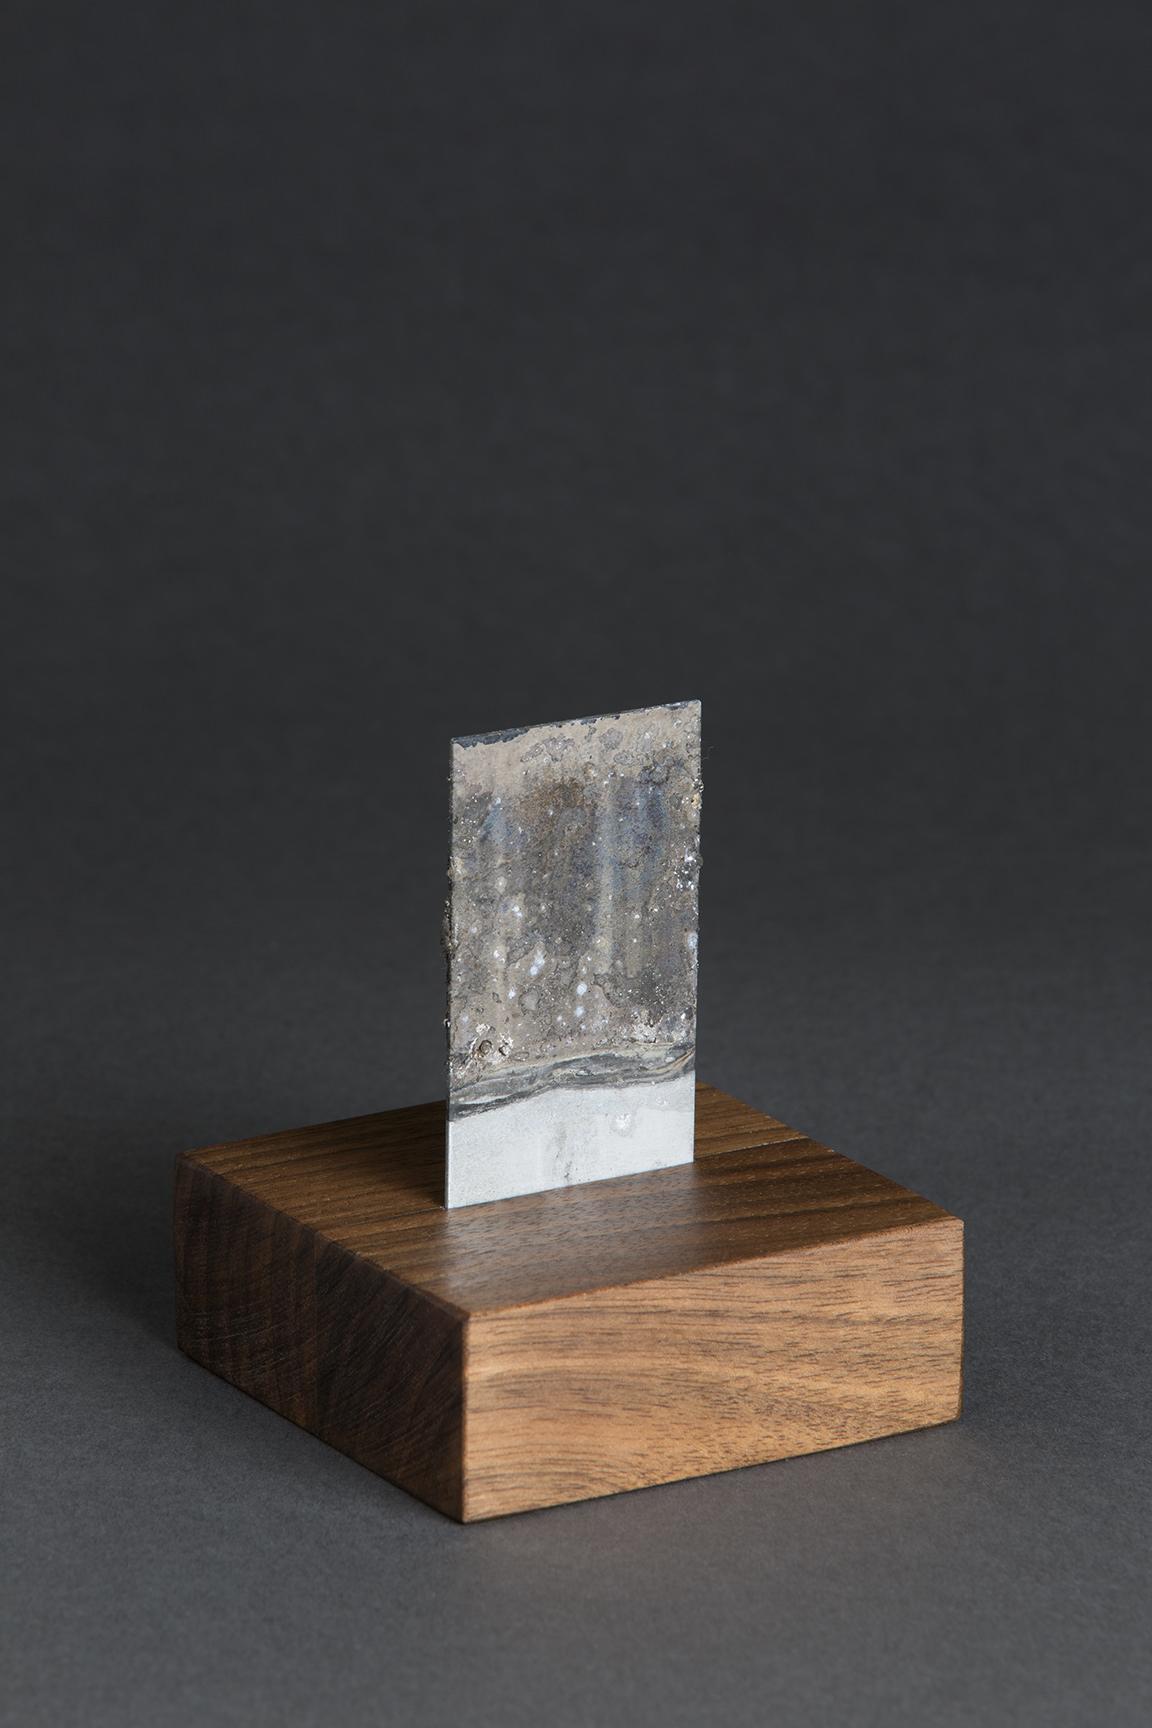 Dobokay Máté: Silver on Zinc, 2019 © Dobokay Máté